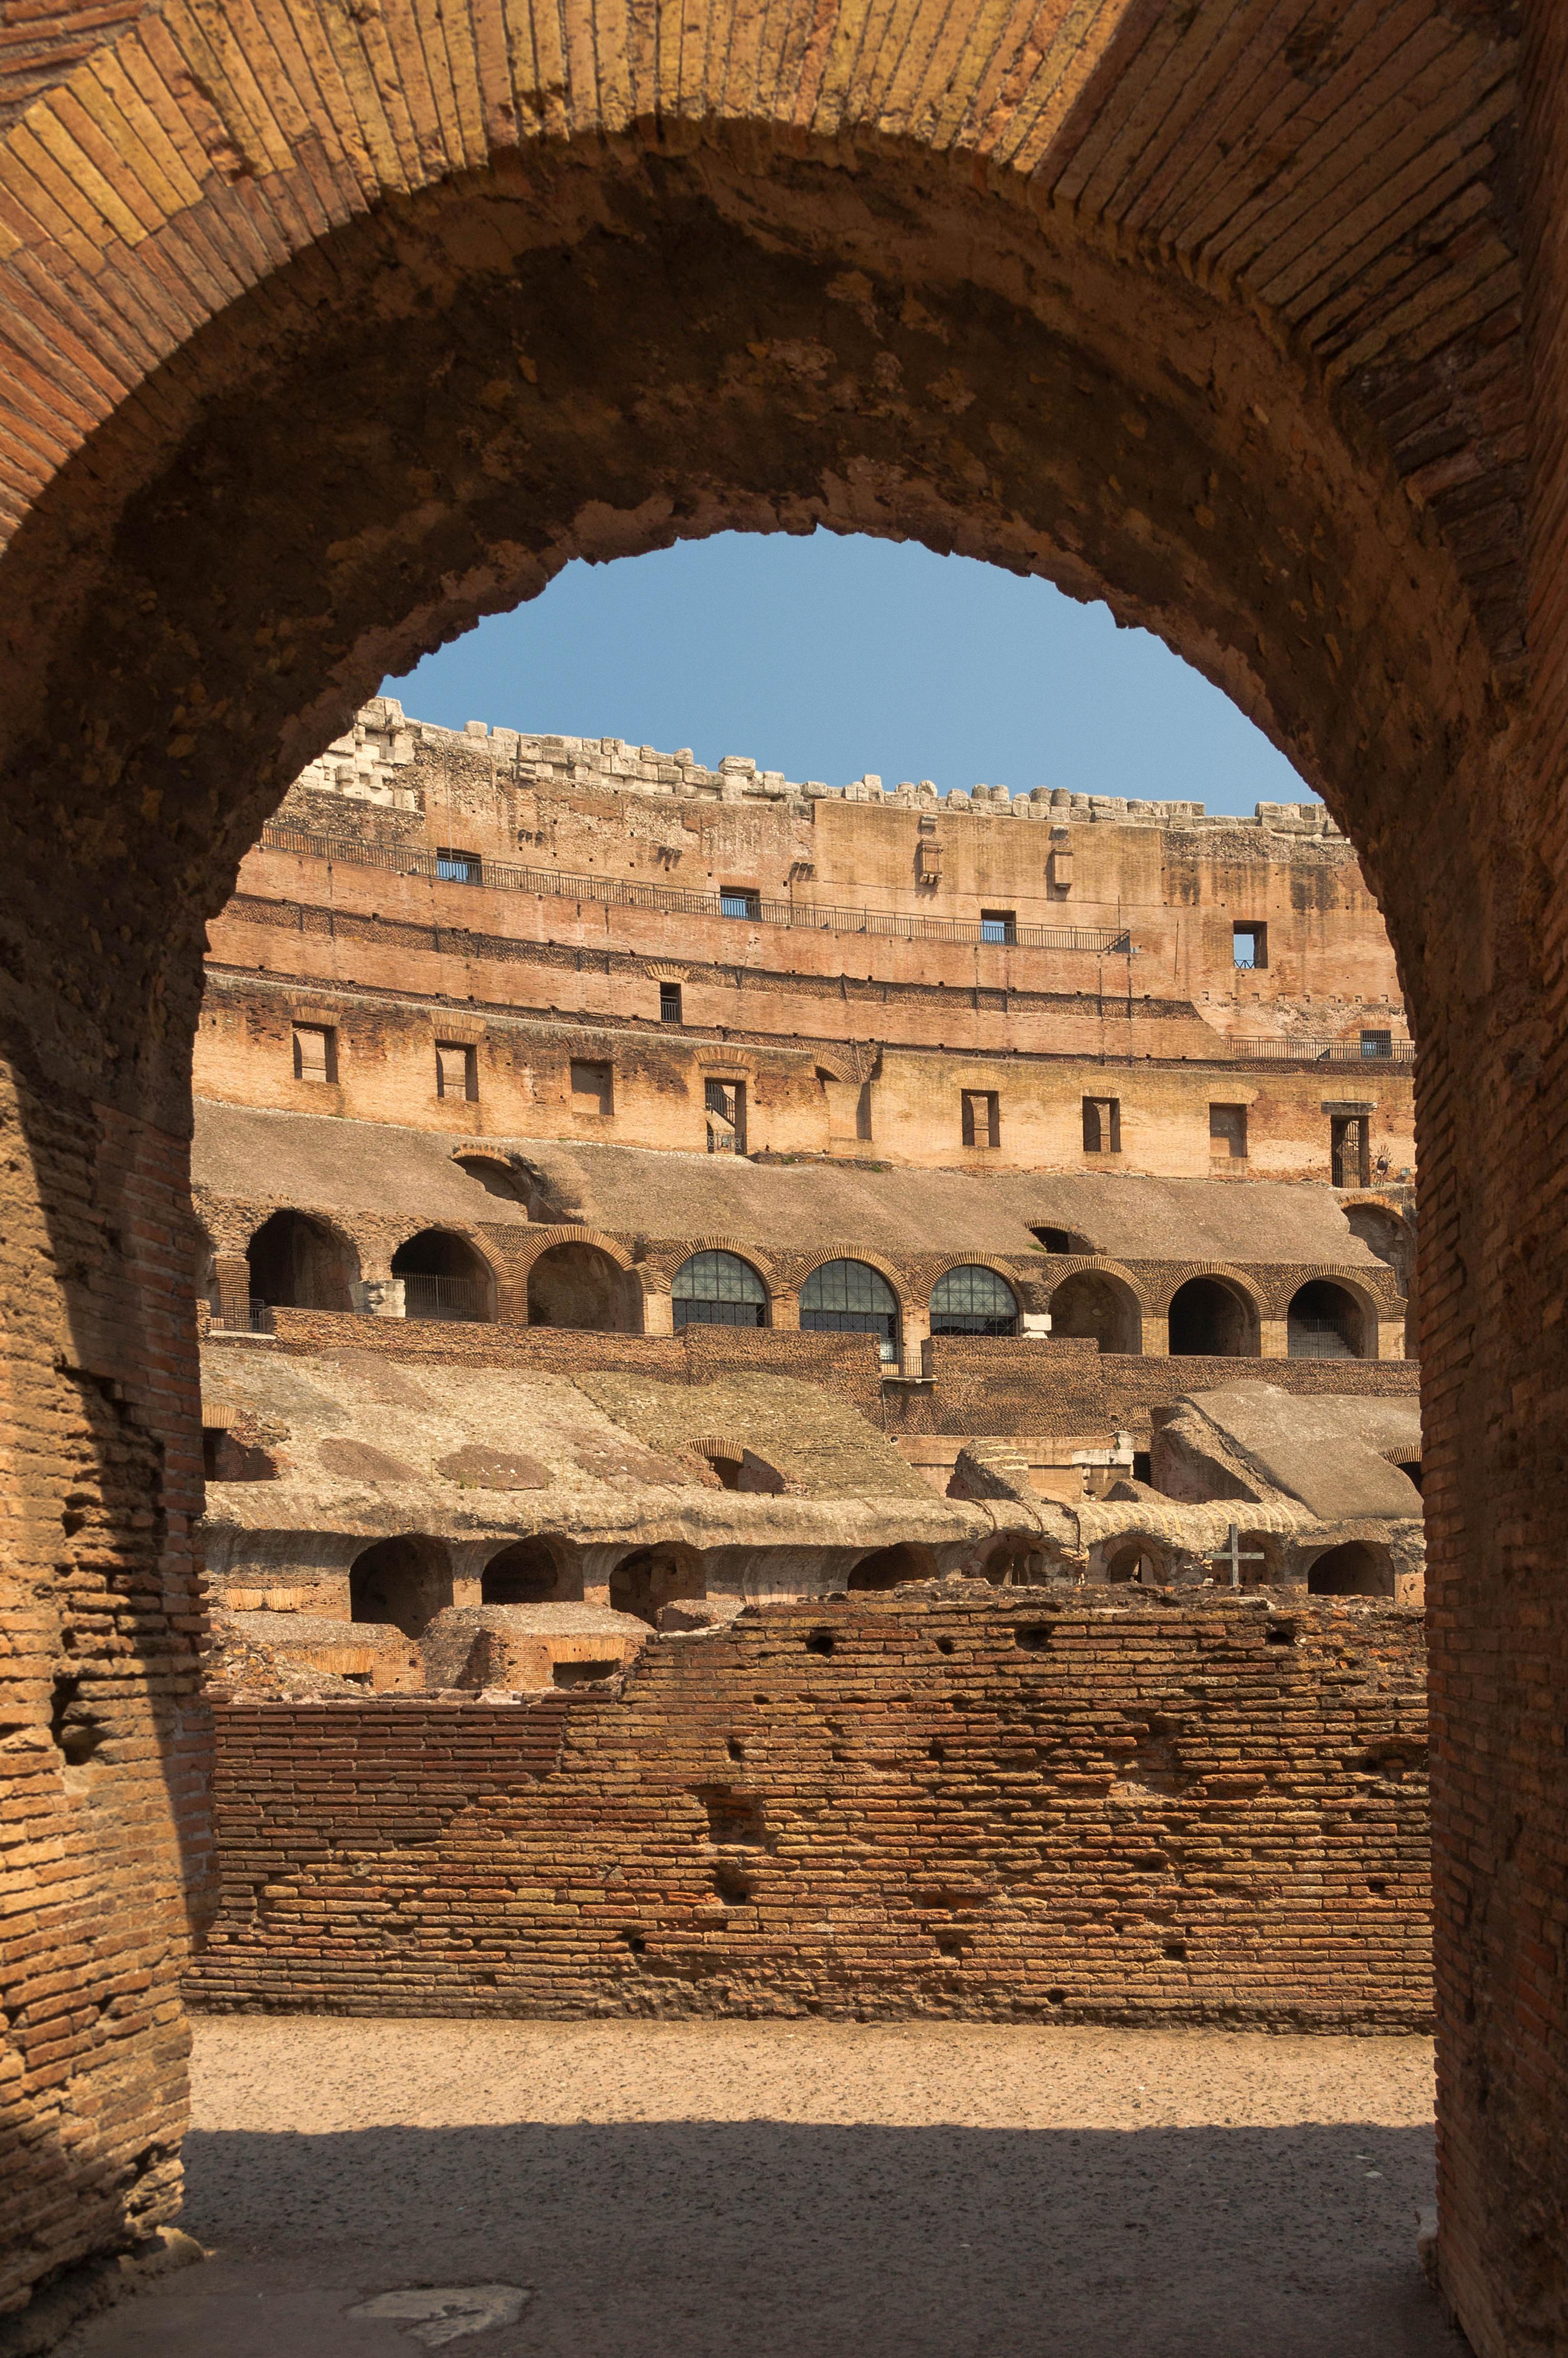 fotos gratis rock estructura interior pared monumento arco columna visin antiguo punto de referencia italia